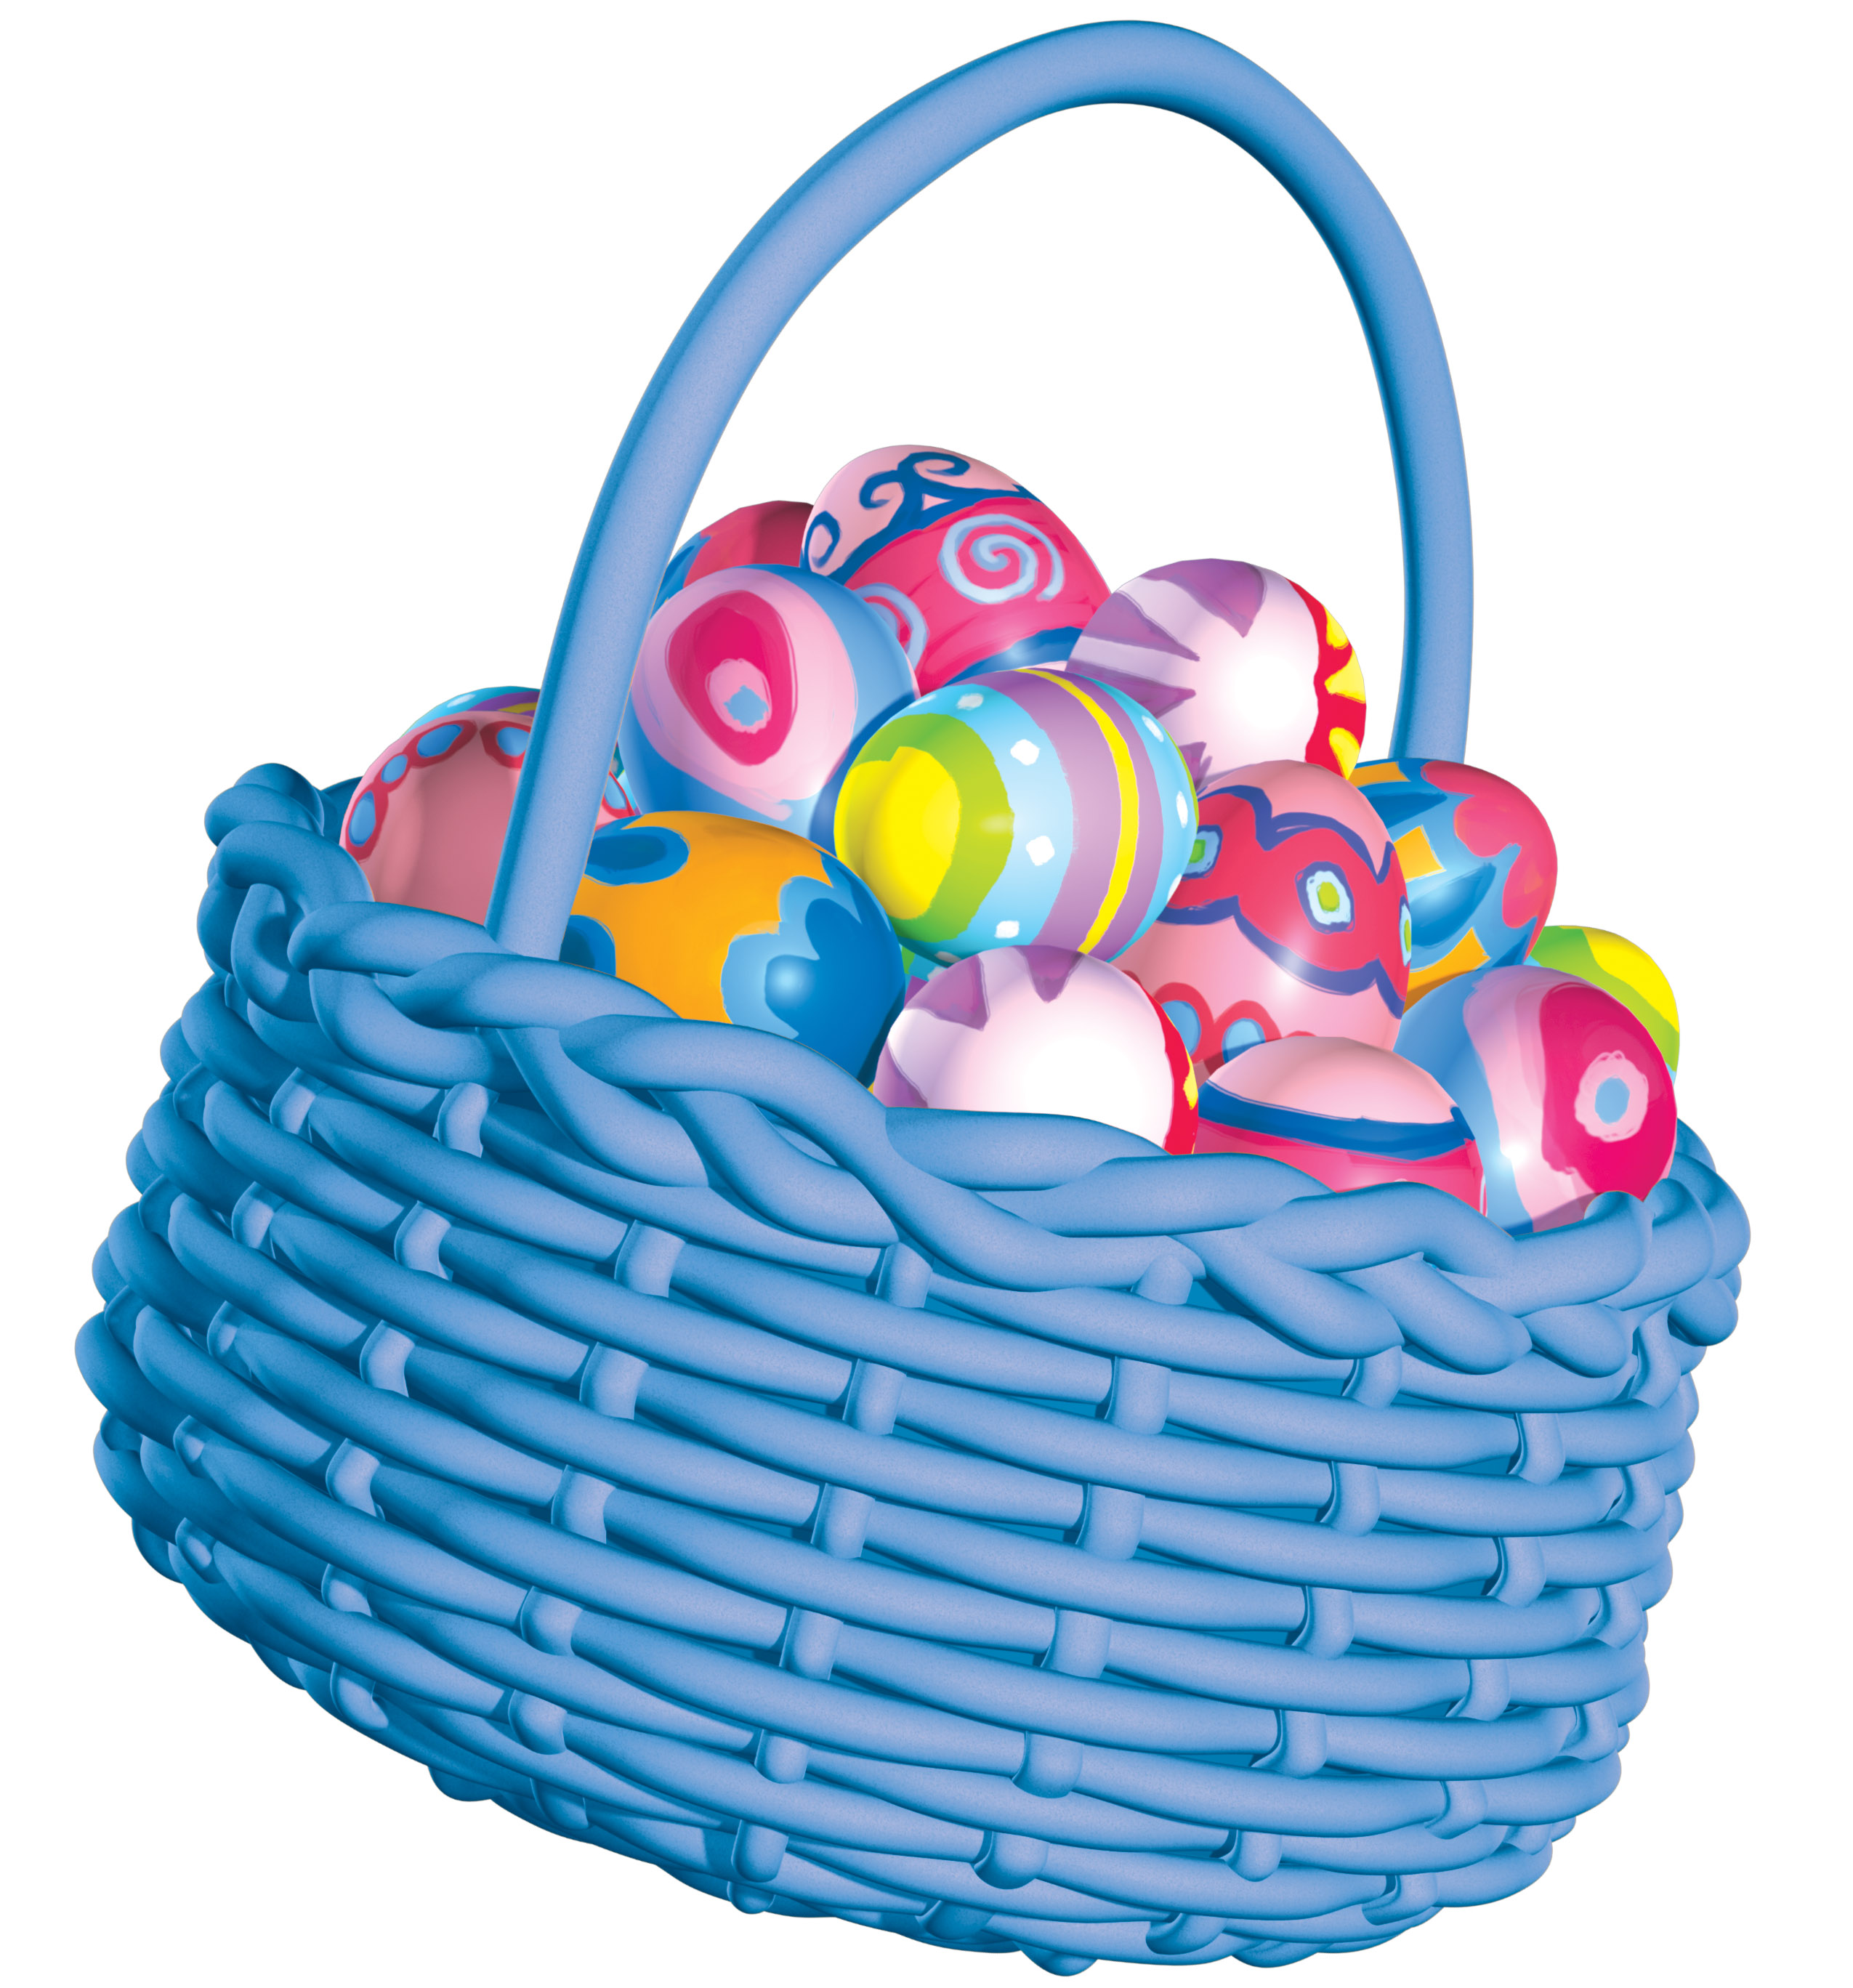 2550x2736 Easter Basket Ideas Clipart